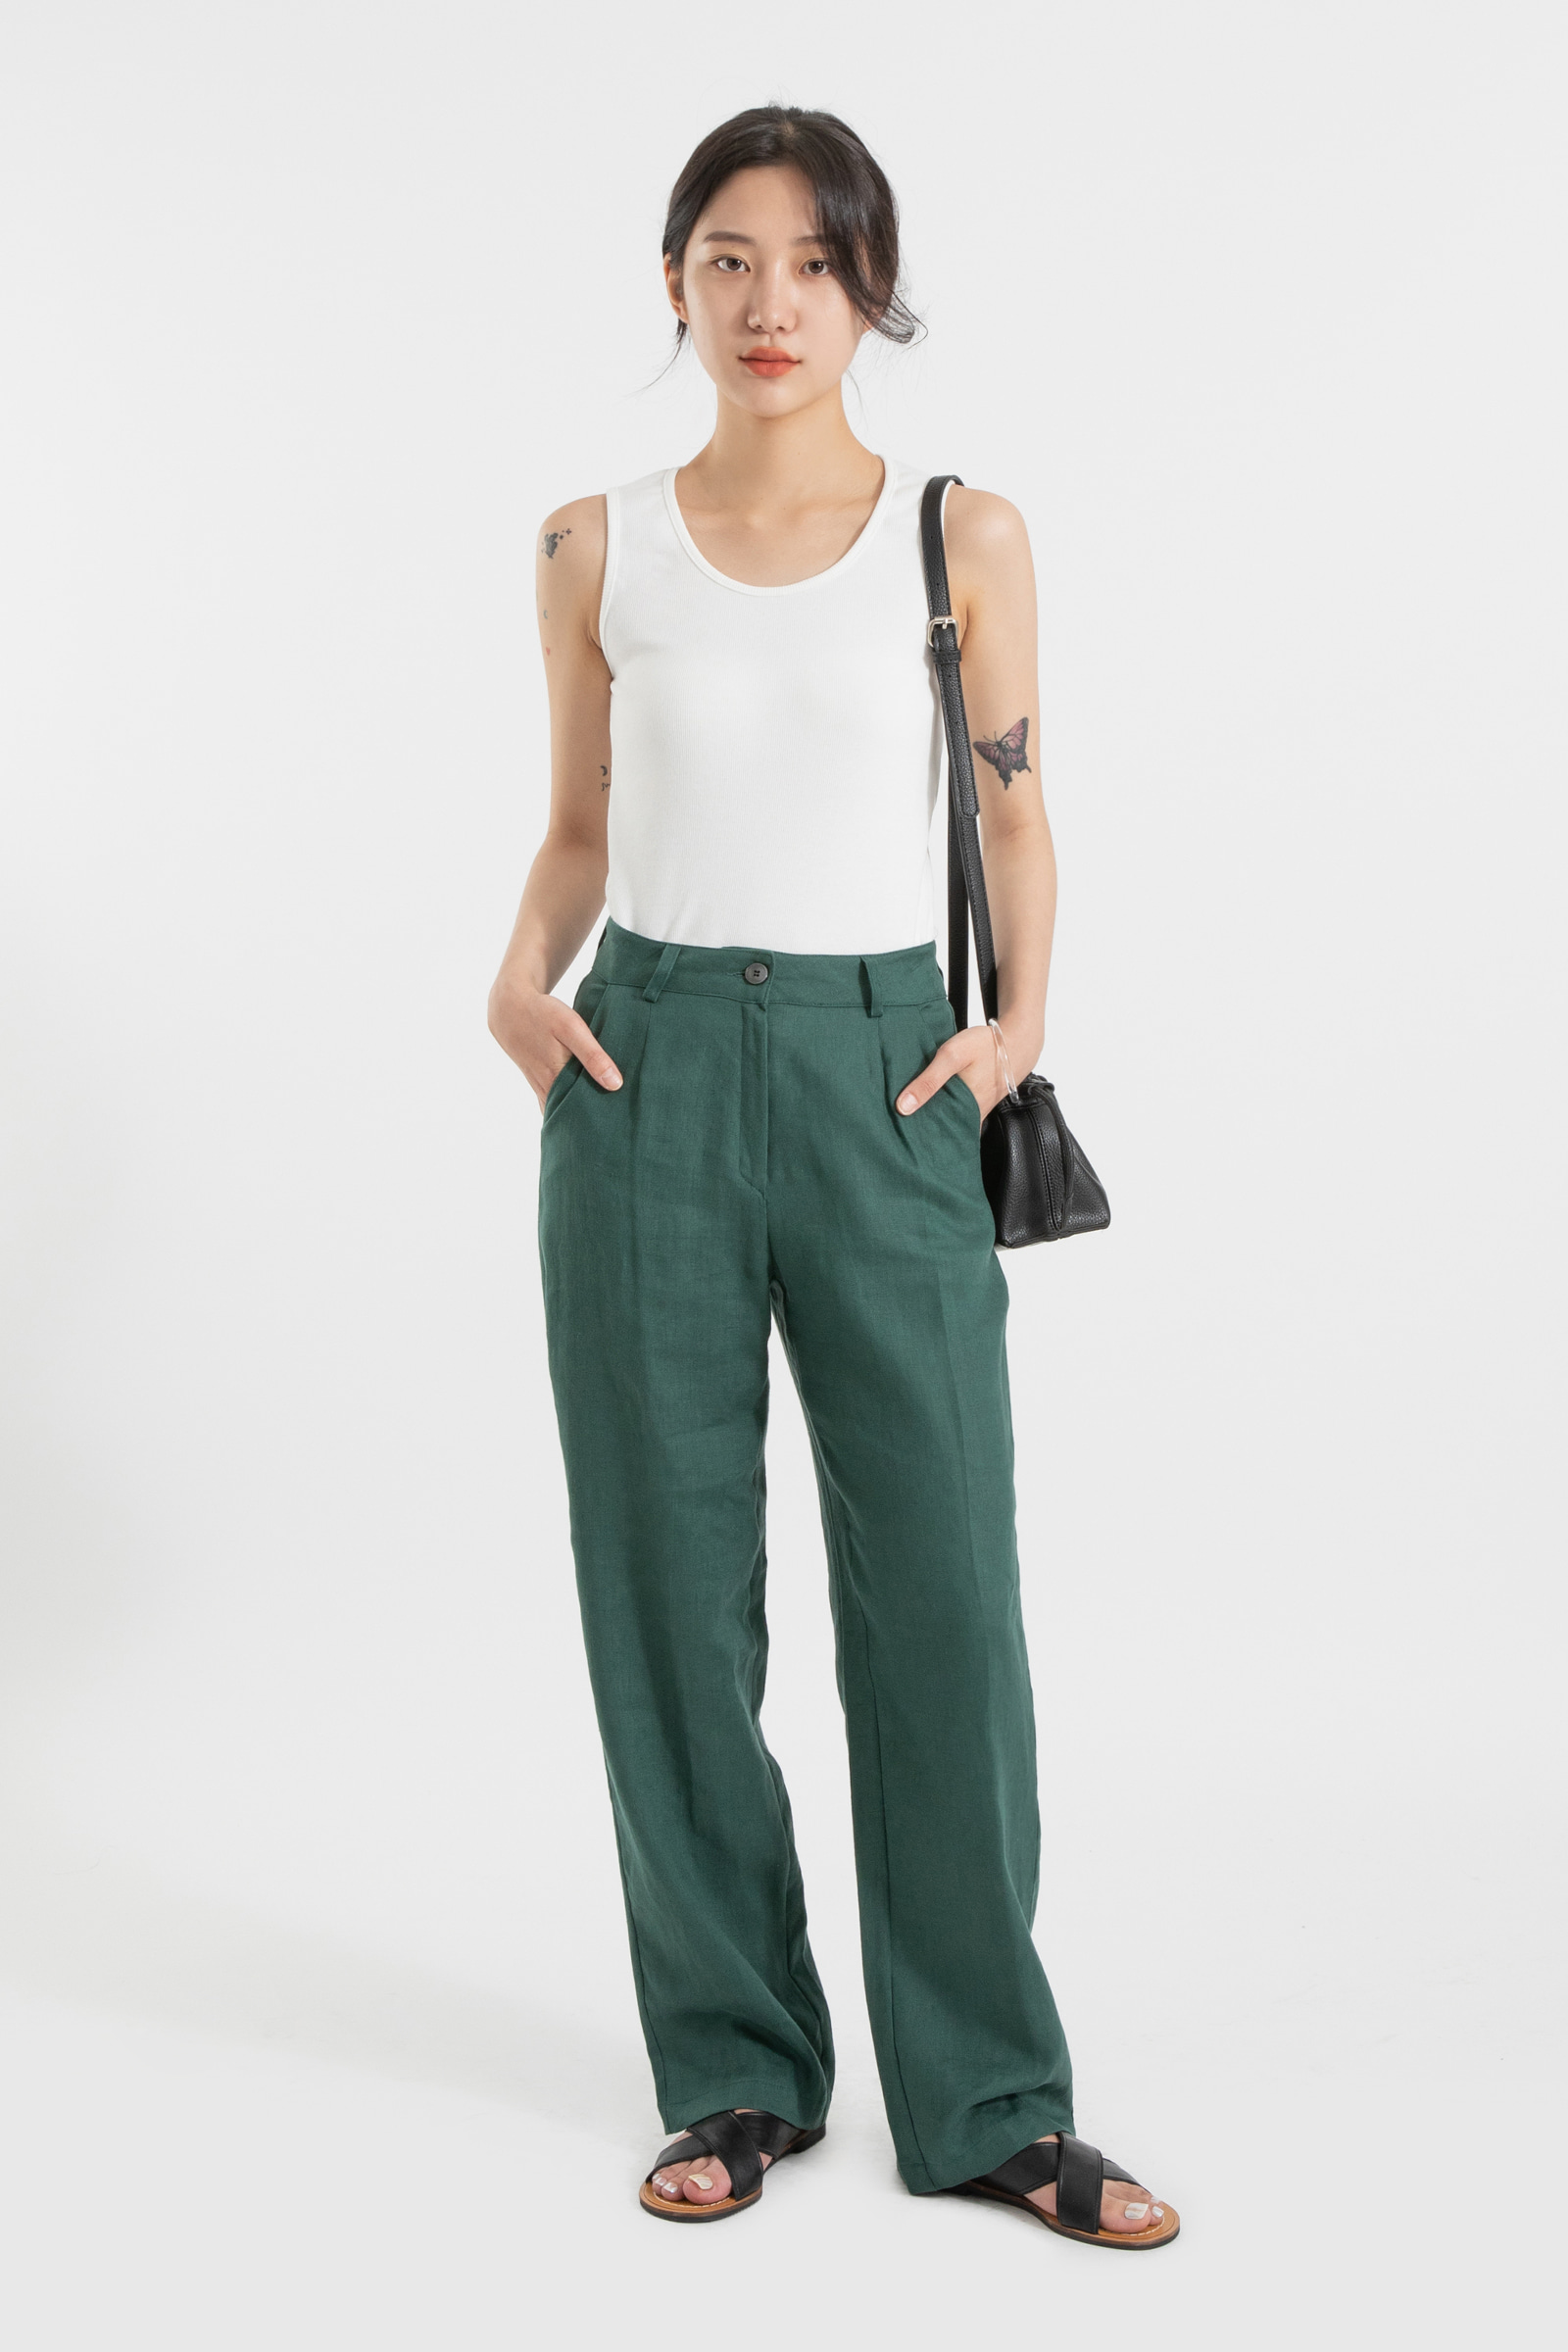 Lona Linen Straight Slacks